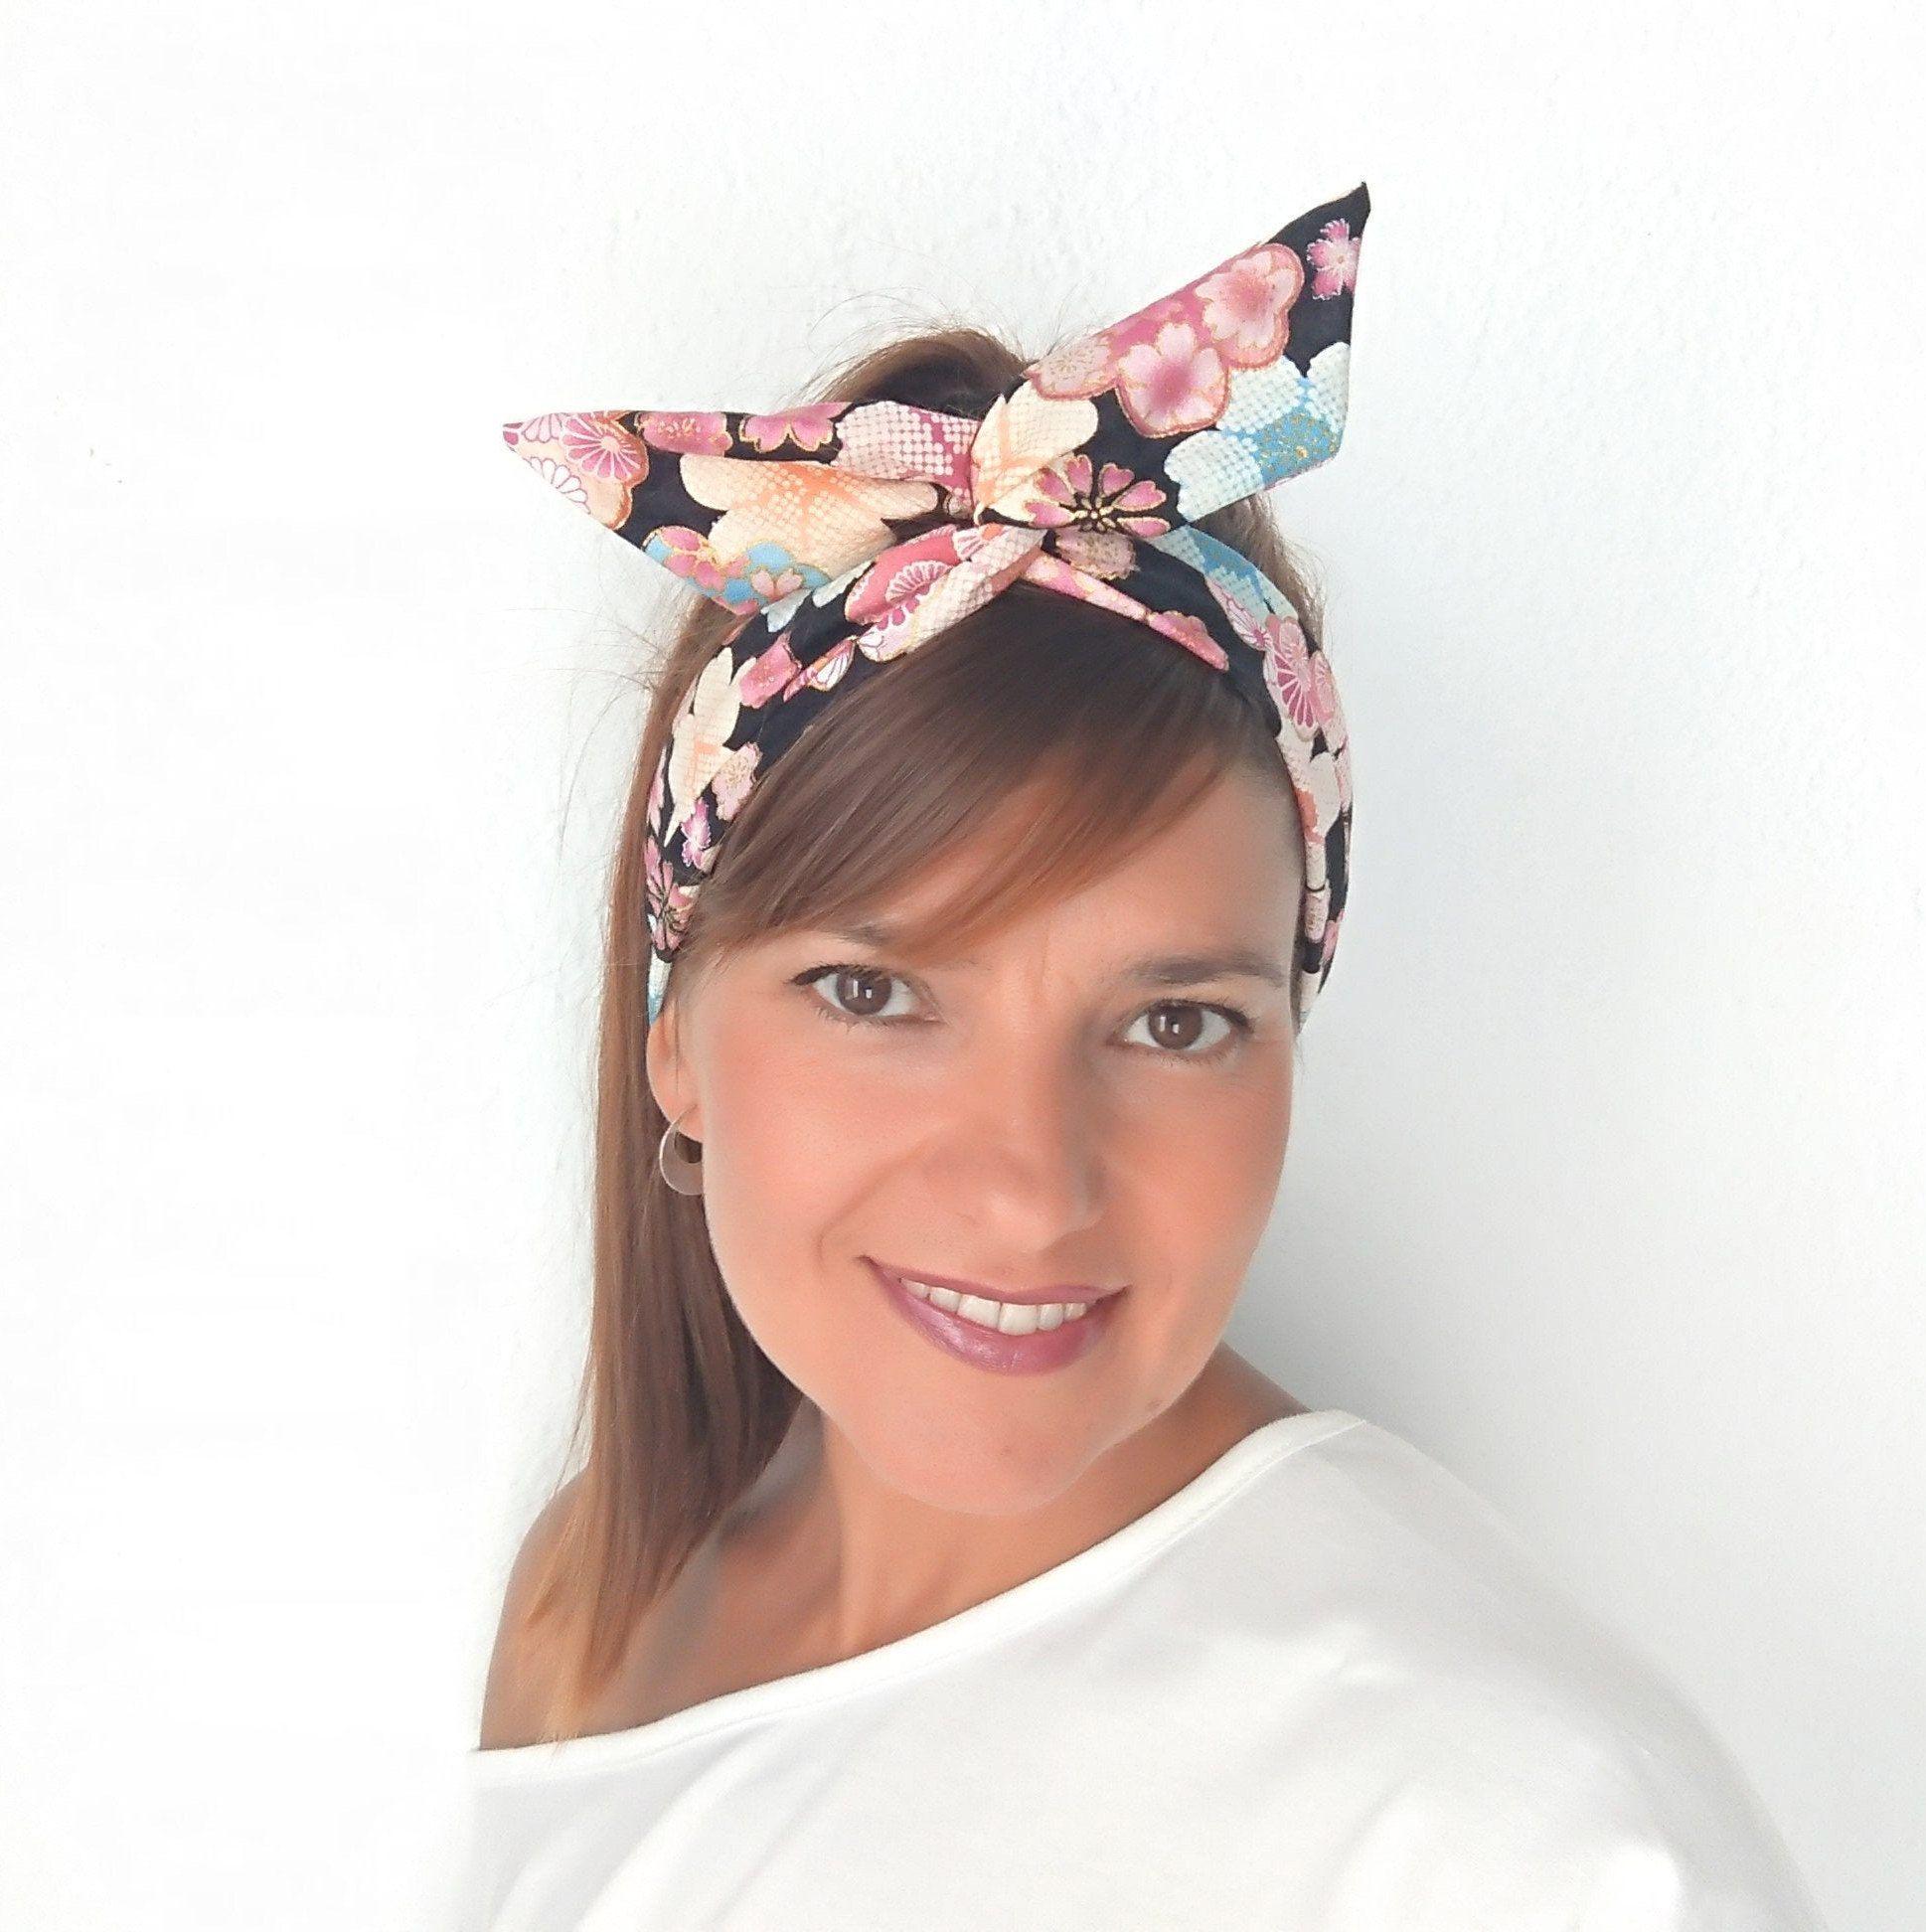 FLORAL BENDY TWIST WIRE HEADWRAP FLOWER HEADBAND HAIR HEAD BAND WRAP SCARF WIRED